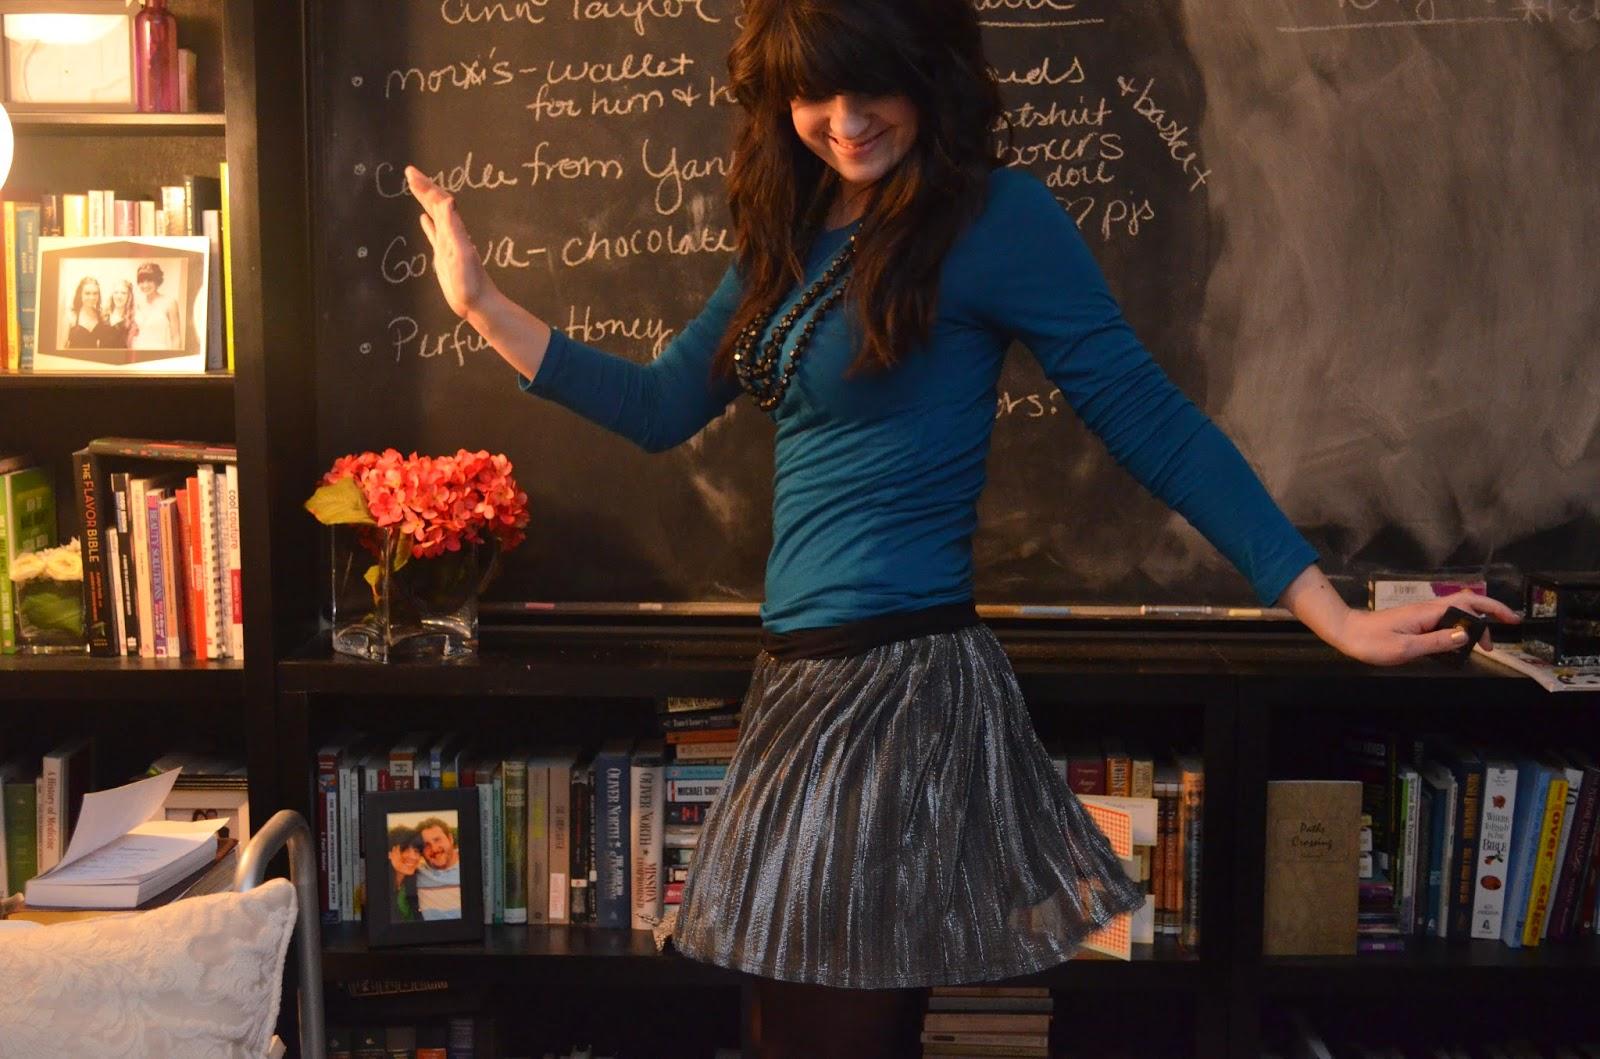 Another metallic twirly skirt